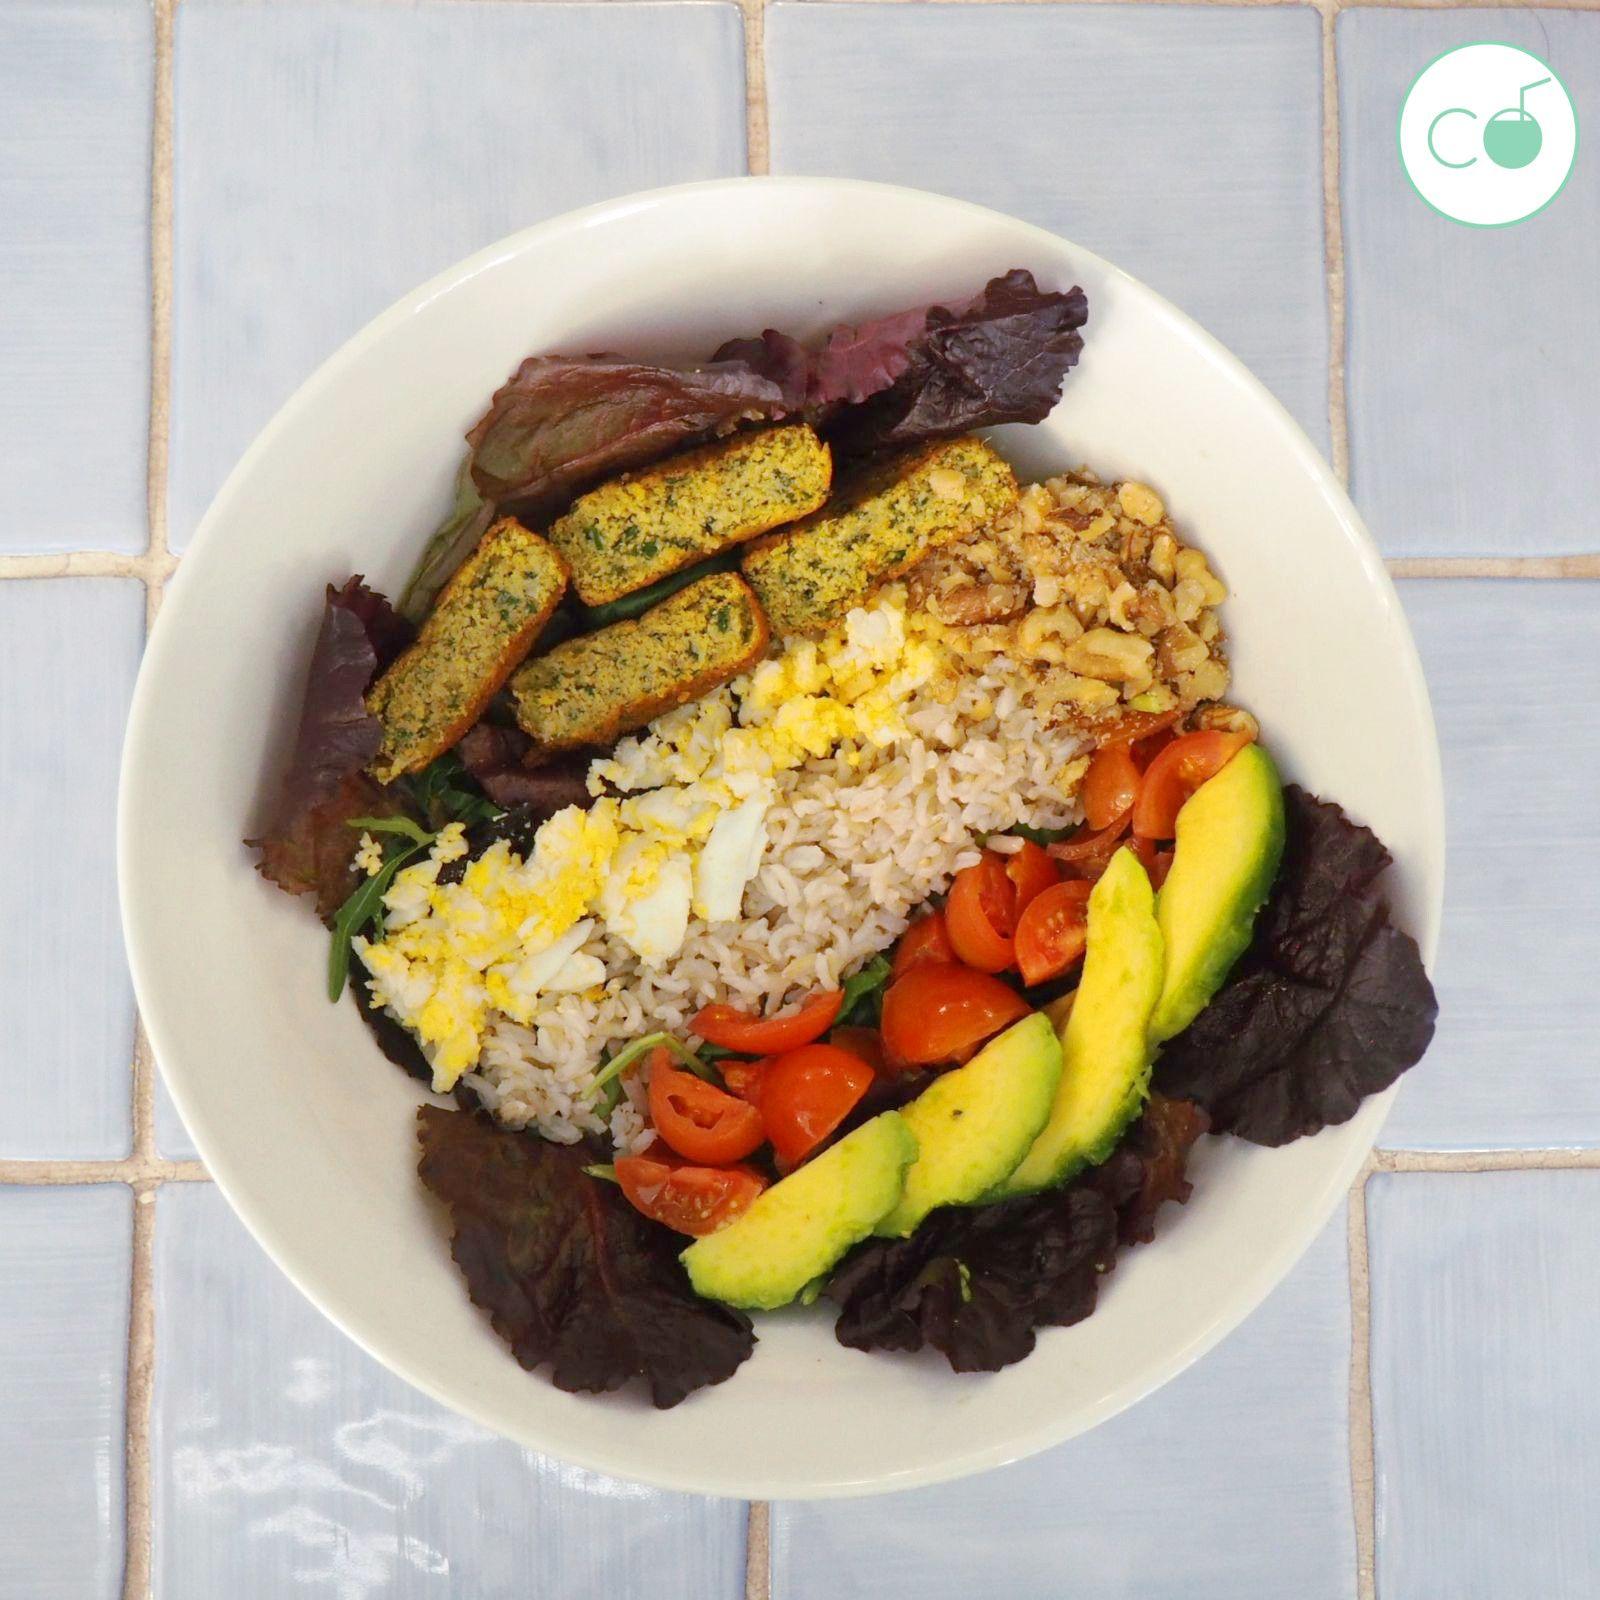 ensalada raw coco madrid